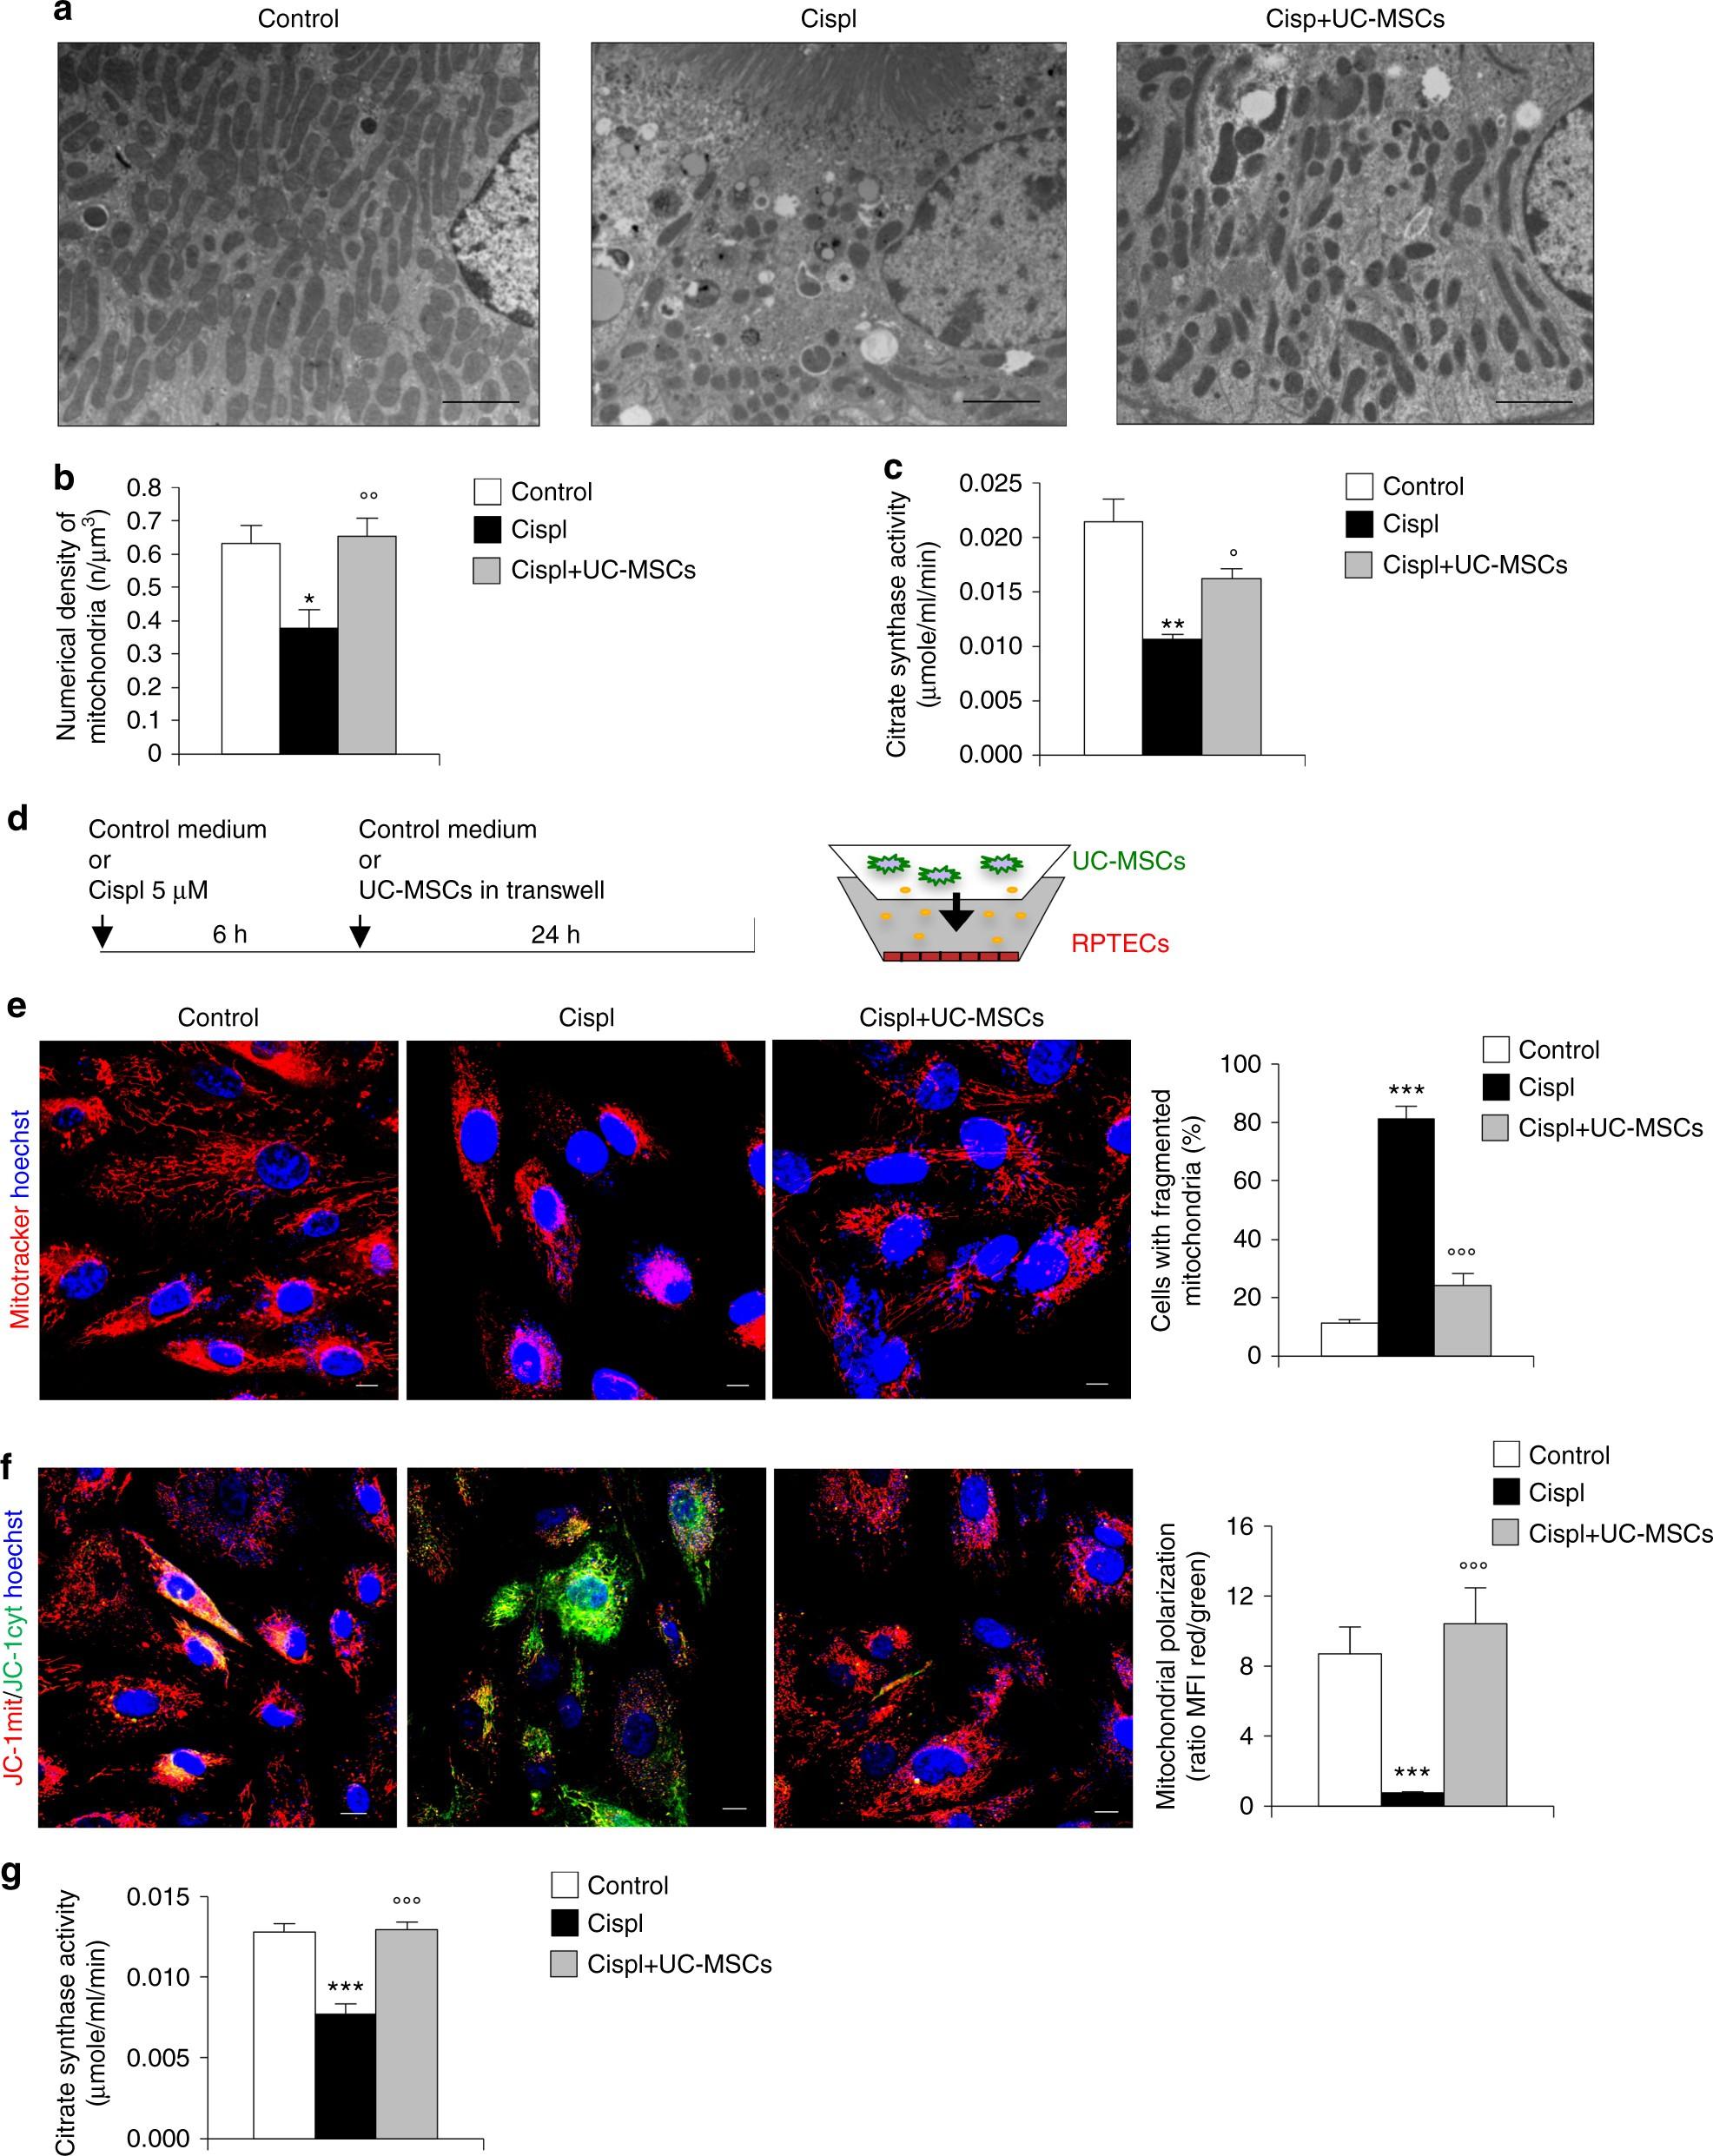 Human mesenchymal stromal cells transplanted into mice